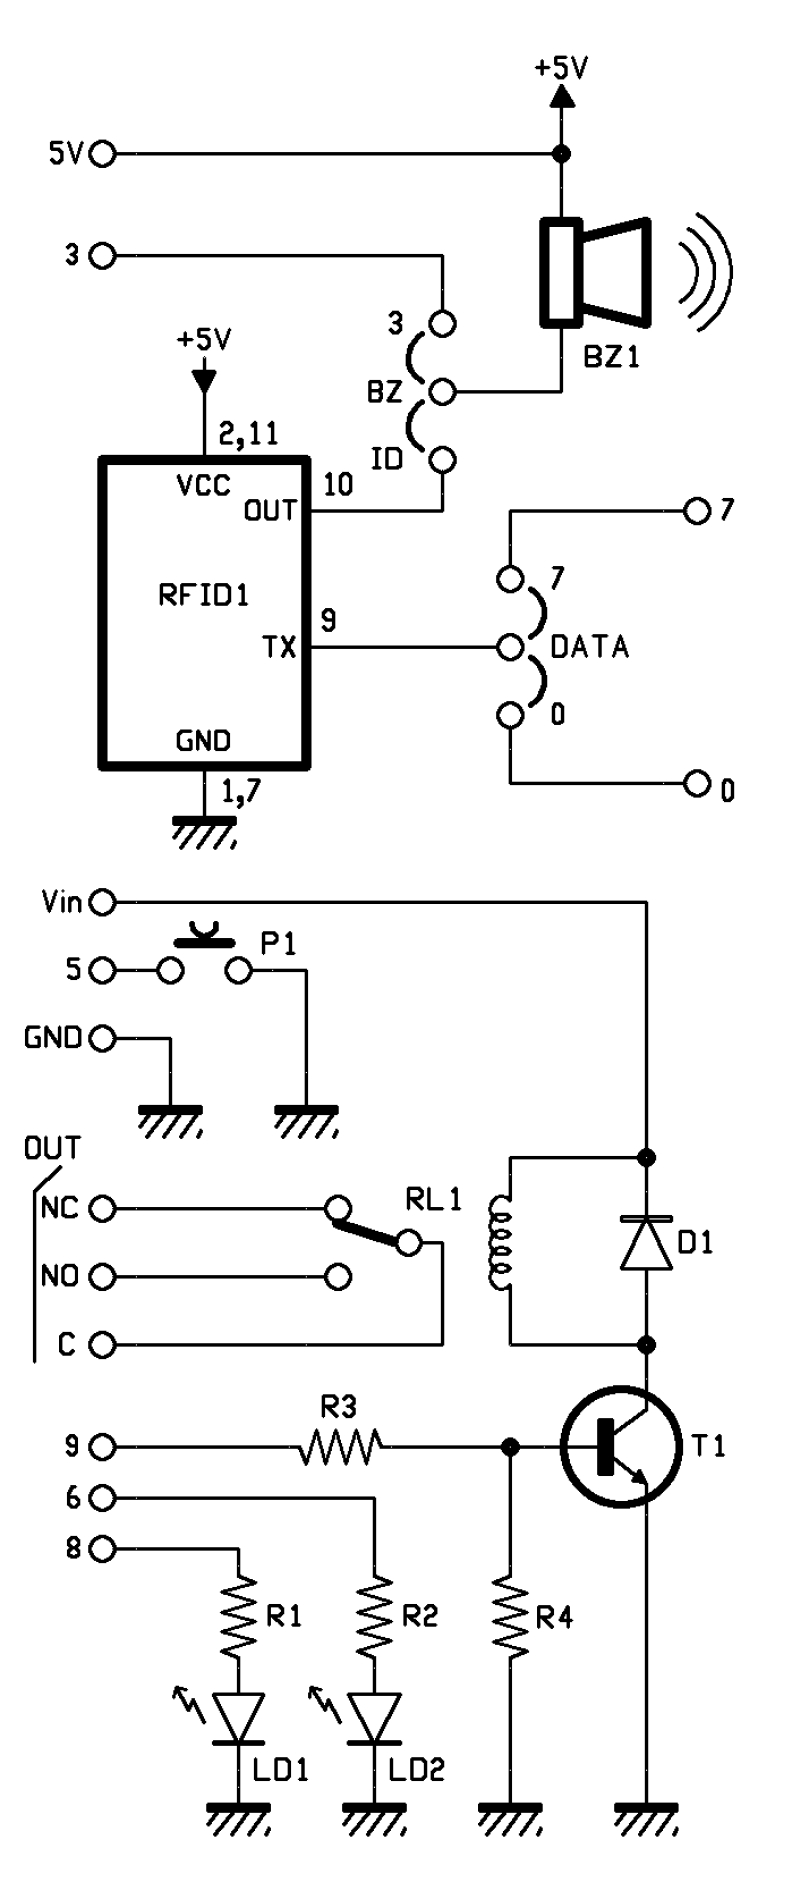 Pin Relay Wiring Diagram Wiring Diagram And Engine Diagram - 5 pole relay wiring diagram